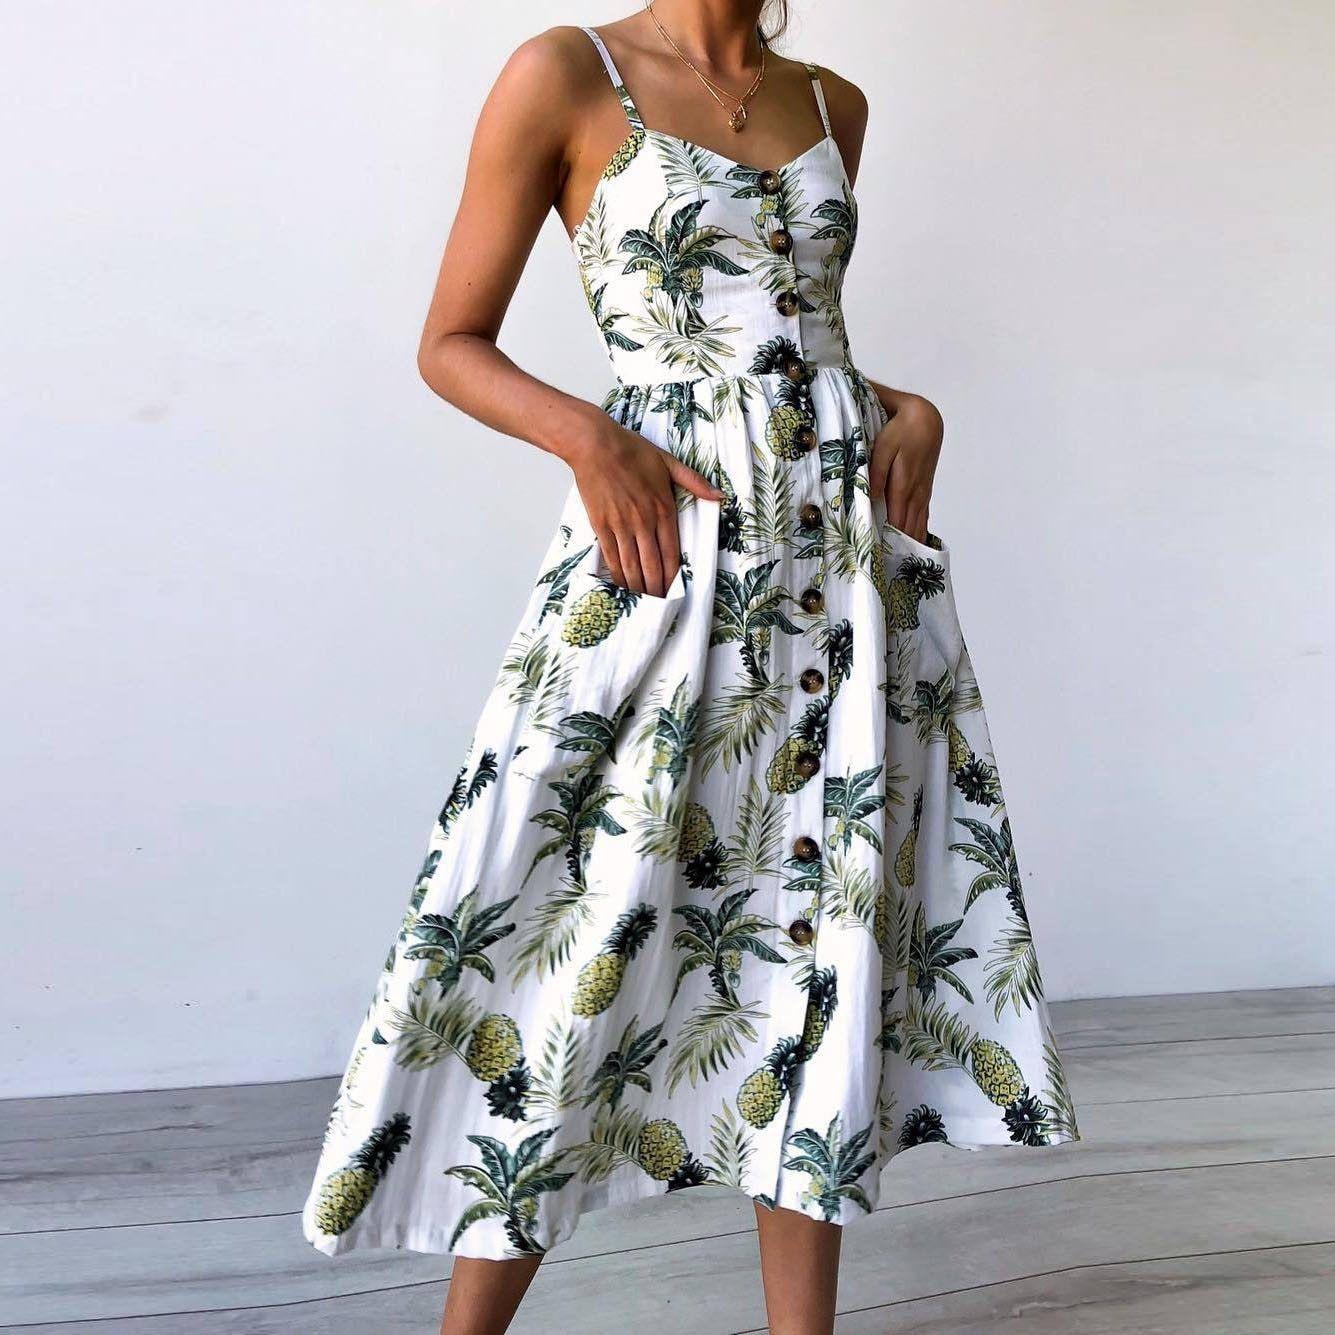 Floral Print Summer Dress Women V Neck Pockets Sleeveless Midi Dresses Buymonday Summer Dresses Printed Beach Dresses Summer Dresses For Women [ 1335 x 1335 Pixel ]